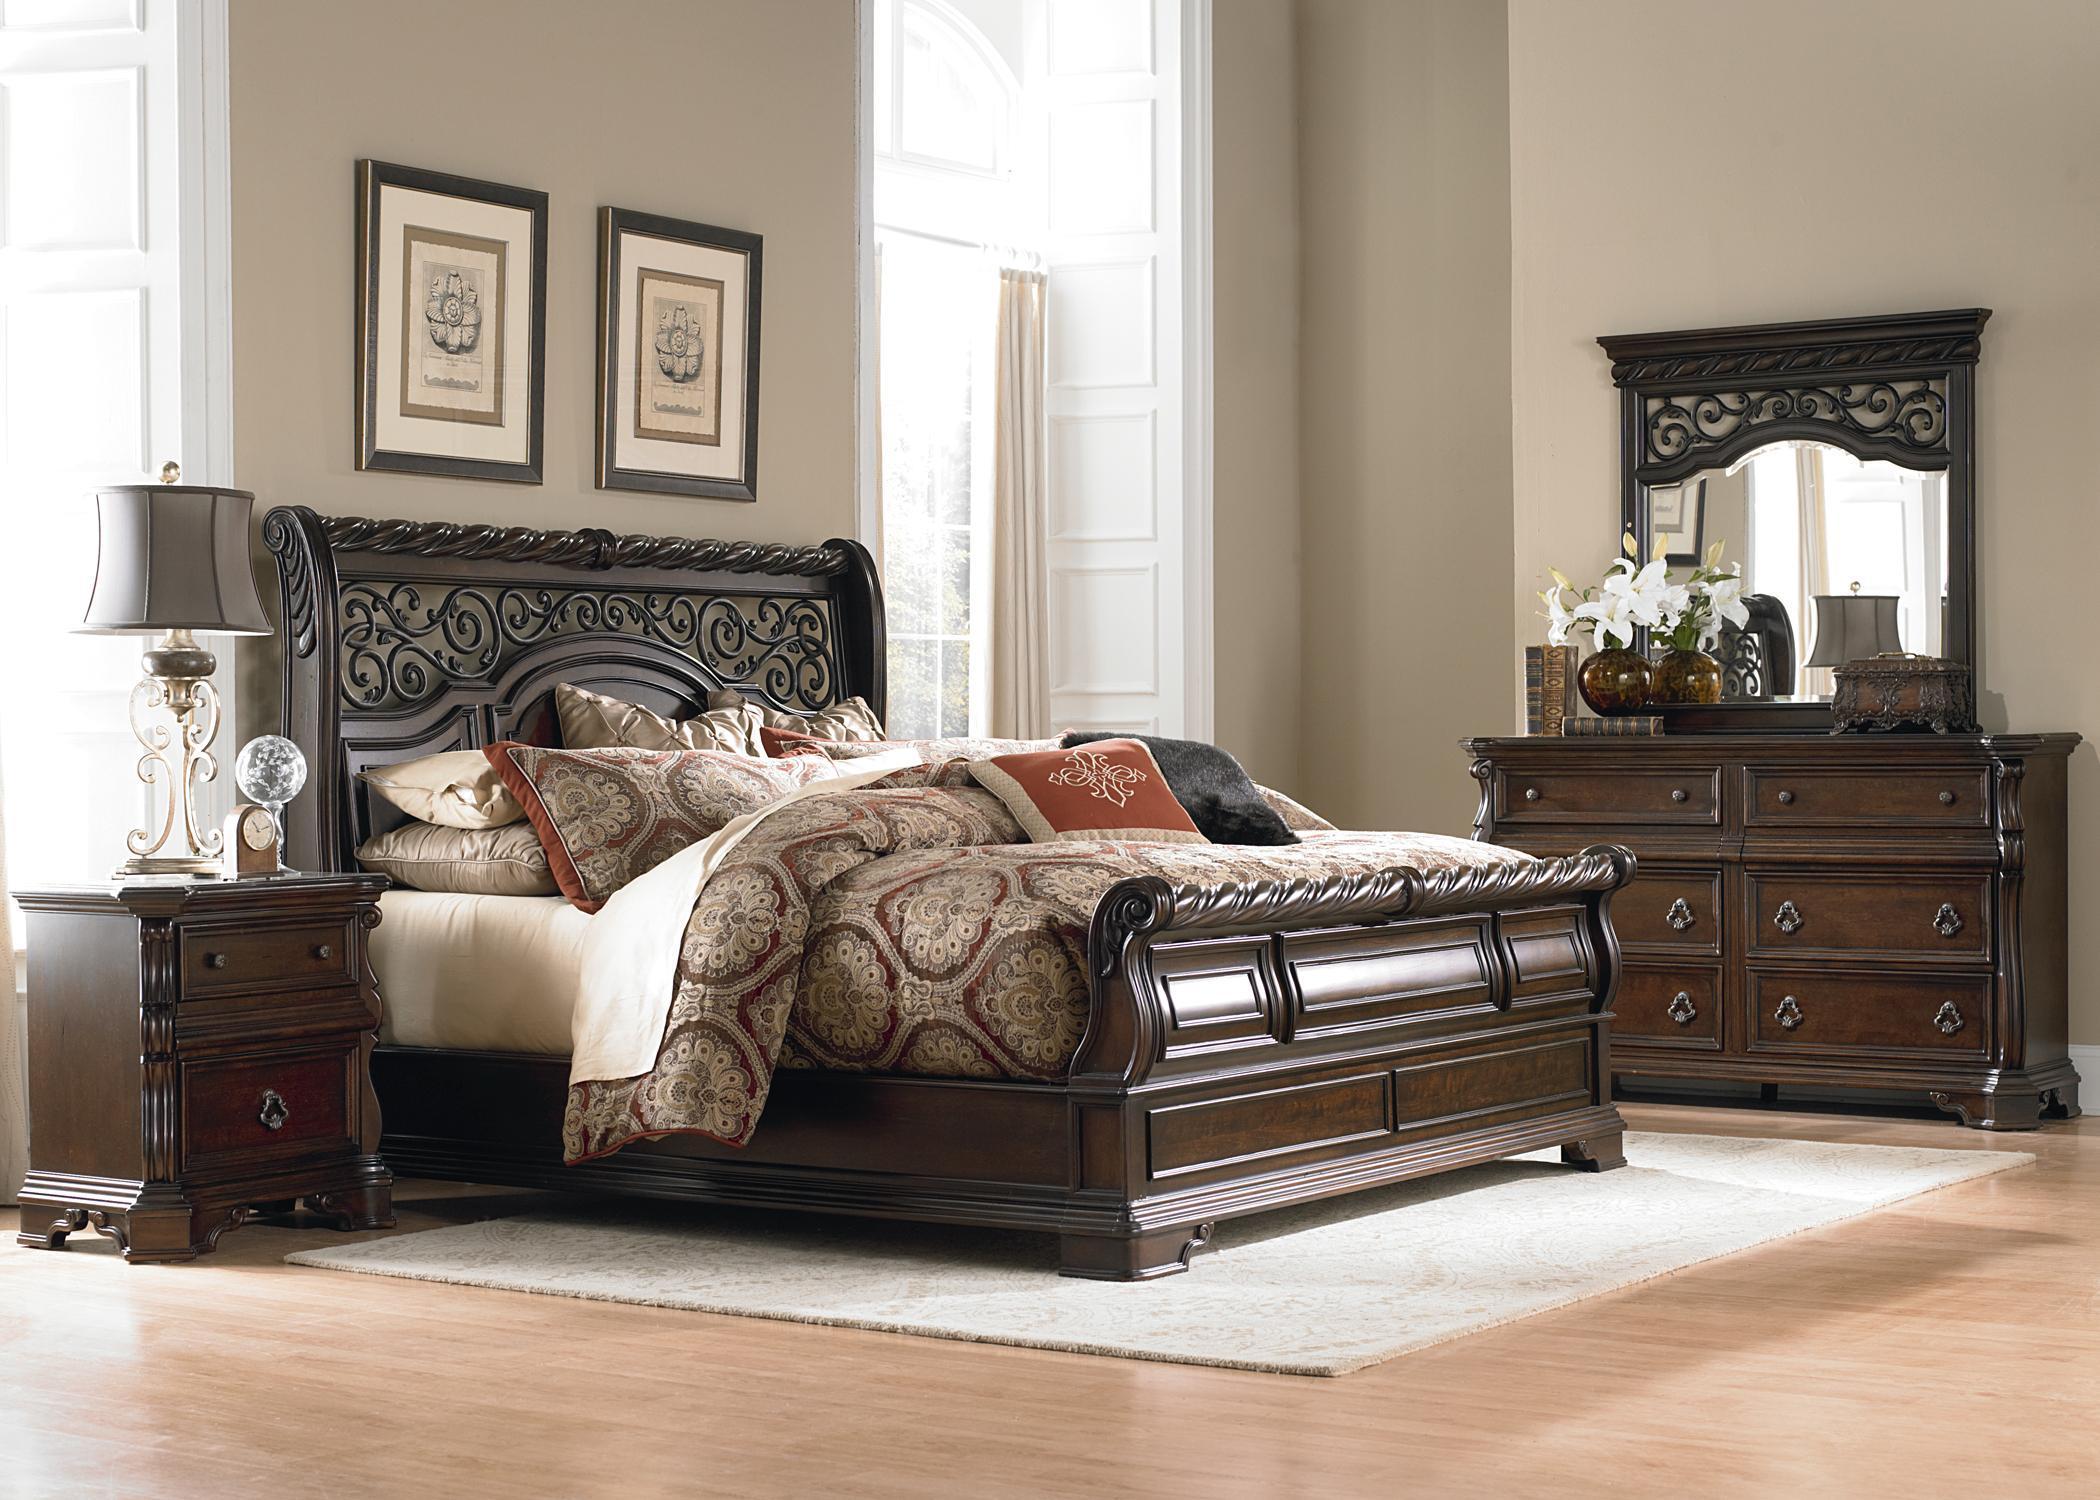 Liberty Furniture Arbor Place LIBE-GRP-575-KINGSUITE King